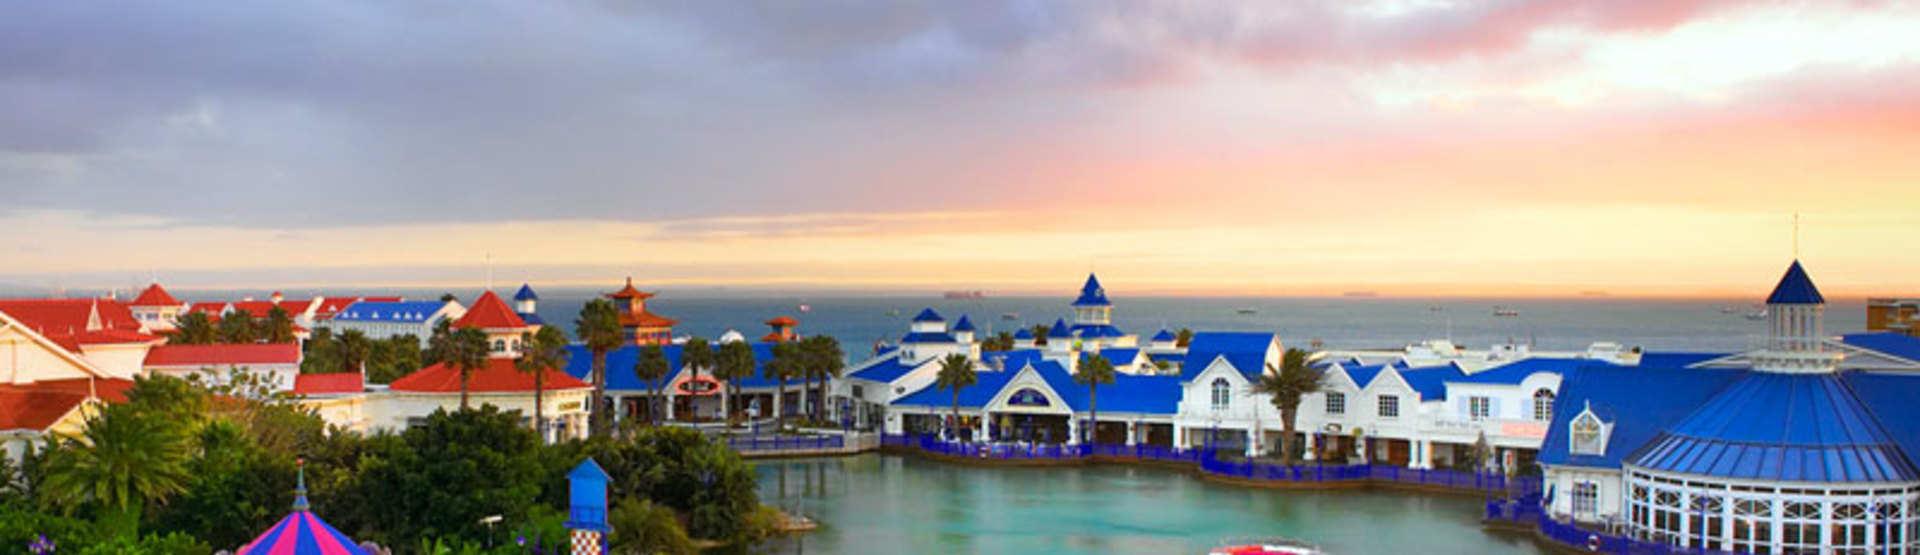 Activities around singa lodge singa - Beach hotel port elizabeth contact details ...